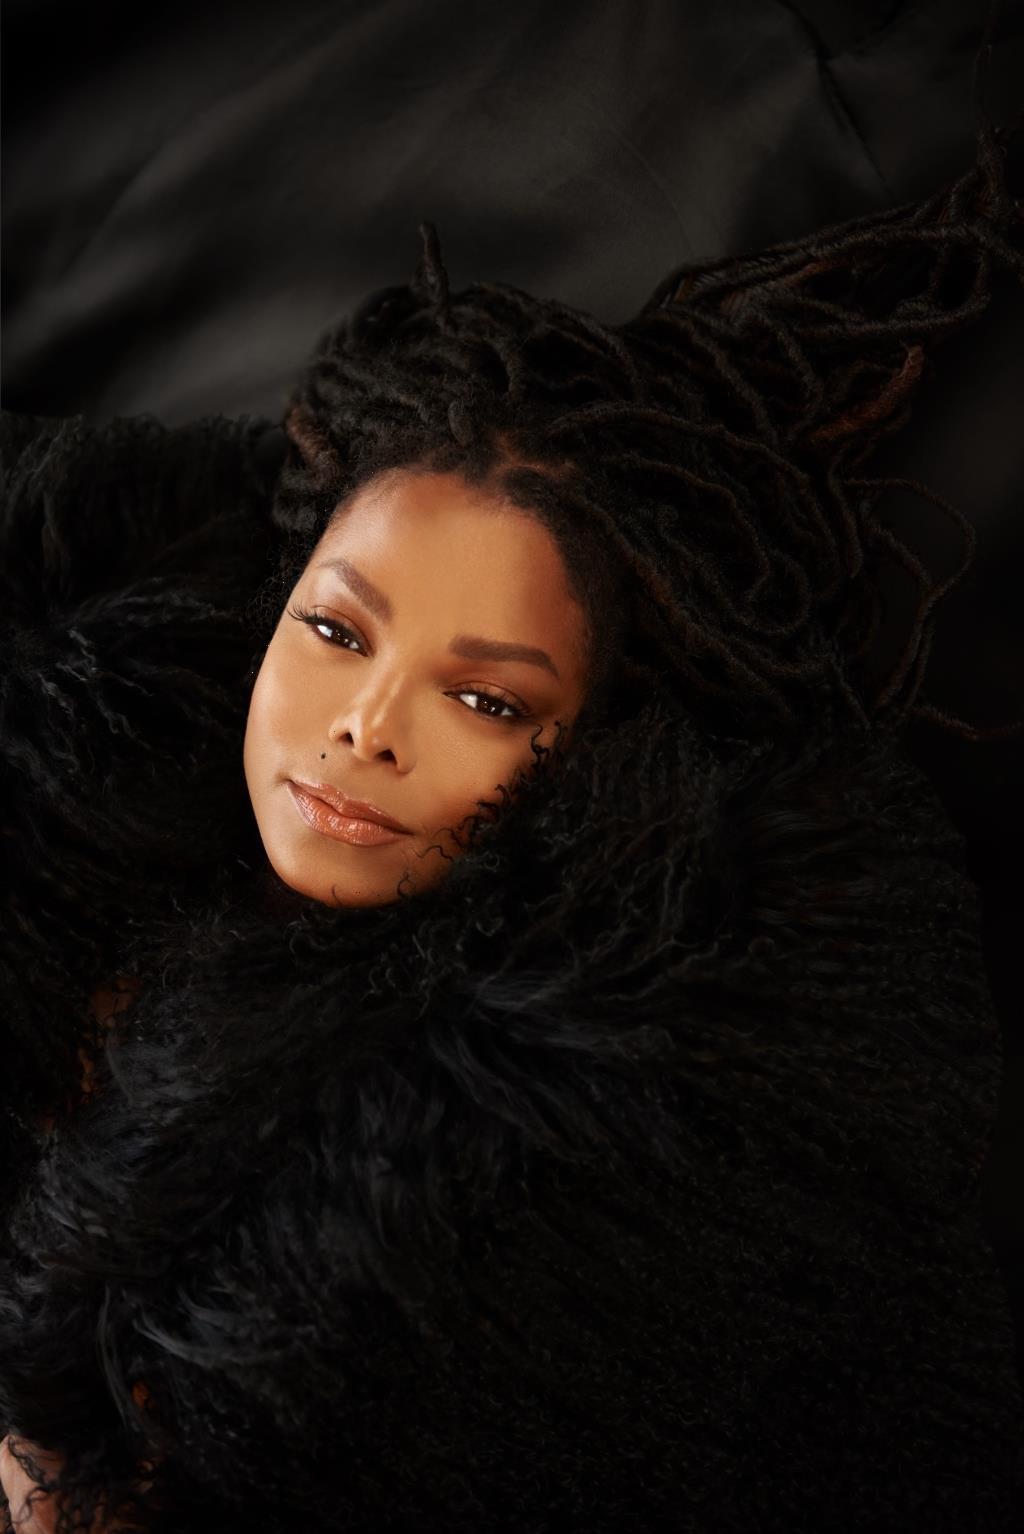 Lifetime / A&E Janet Jackson Doc: Banijay Rights To Distribute